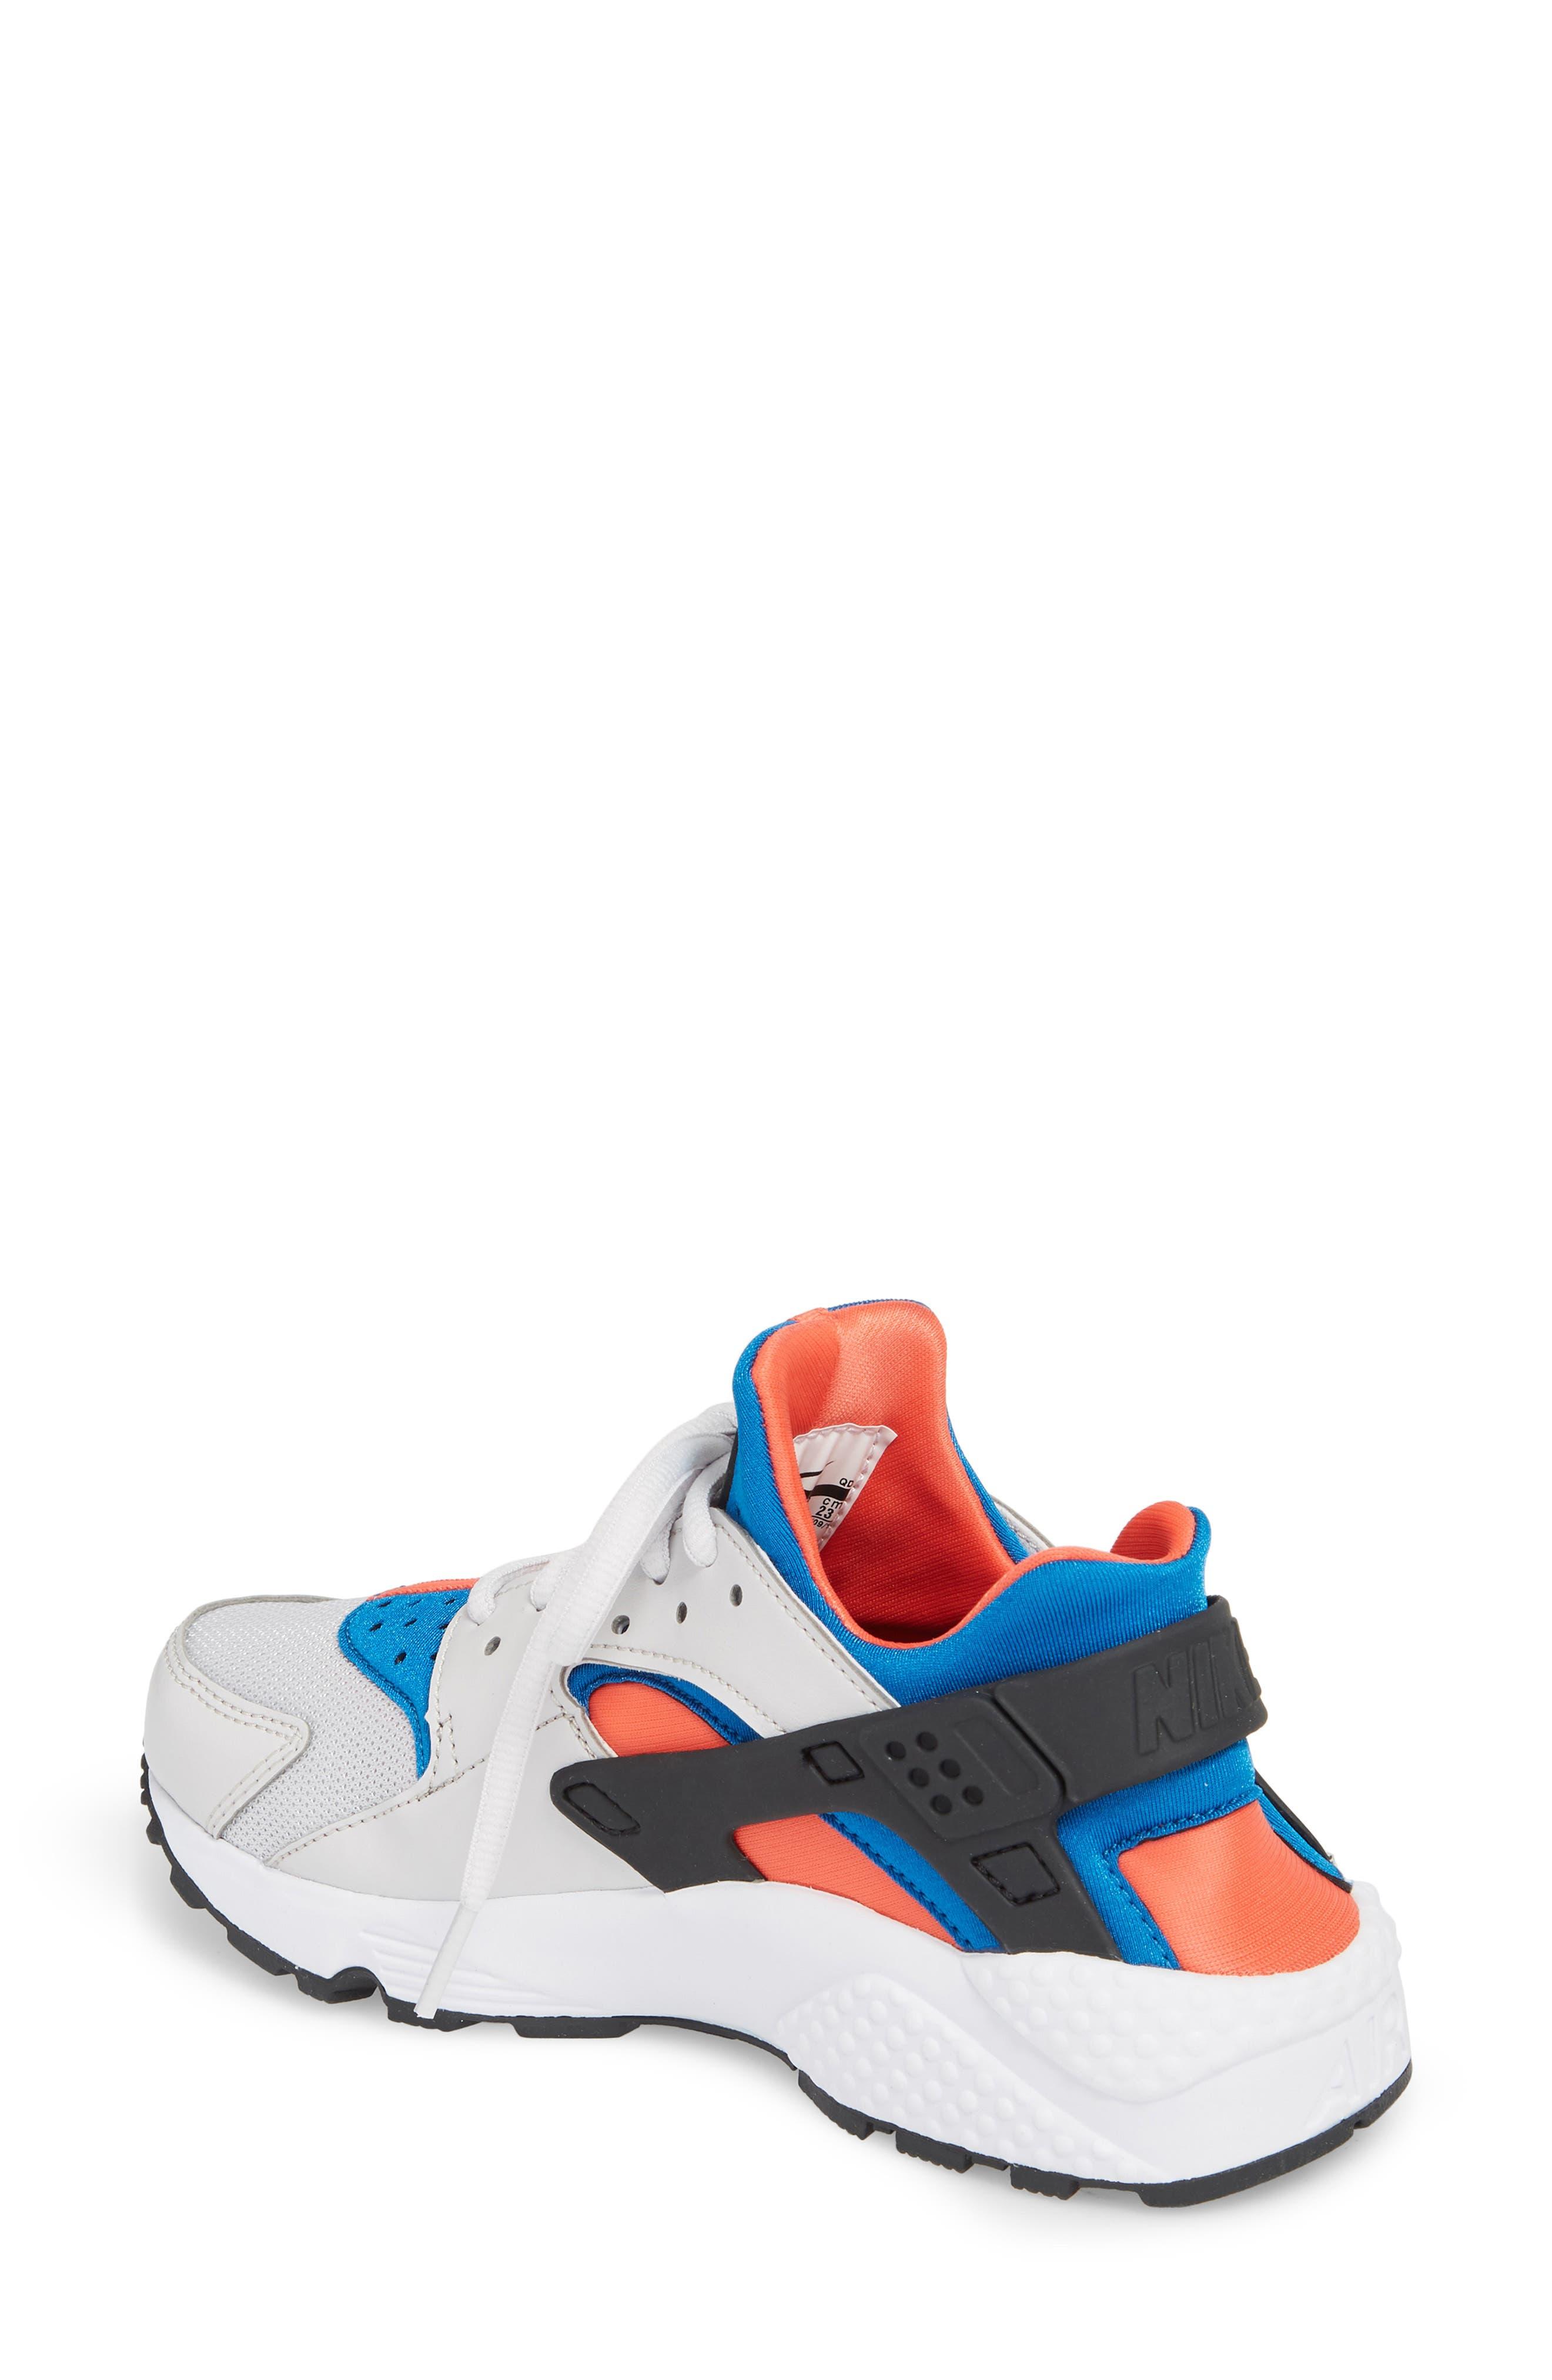 Air Huarache Run Sneaker,                             Alternate thumbnail 2, color,                             Grey/ Black/ Coral/ Nebula